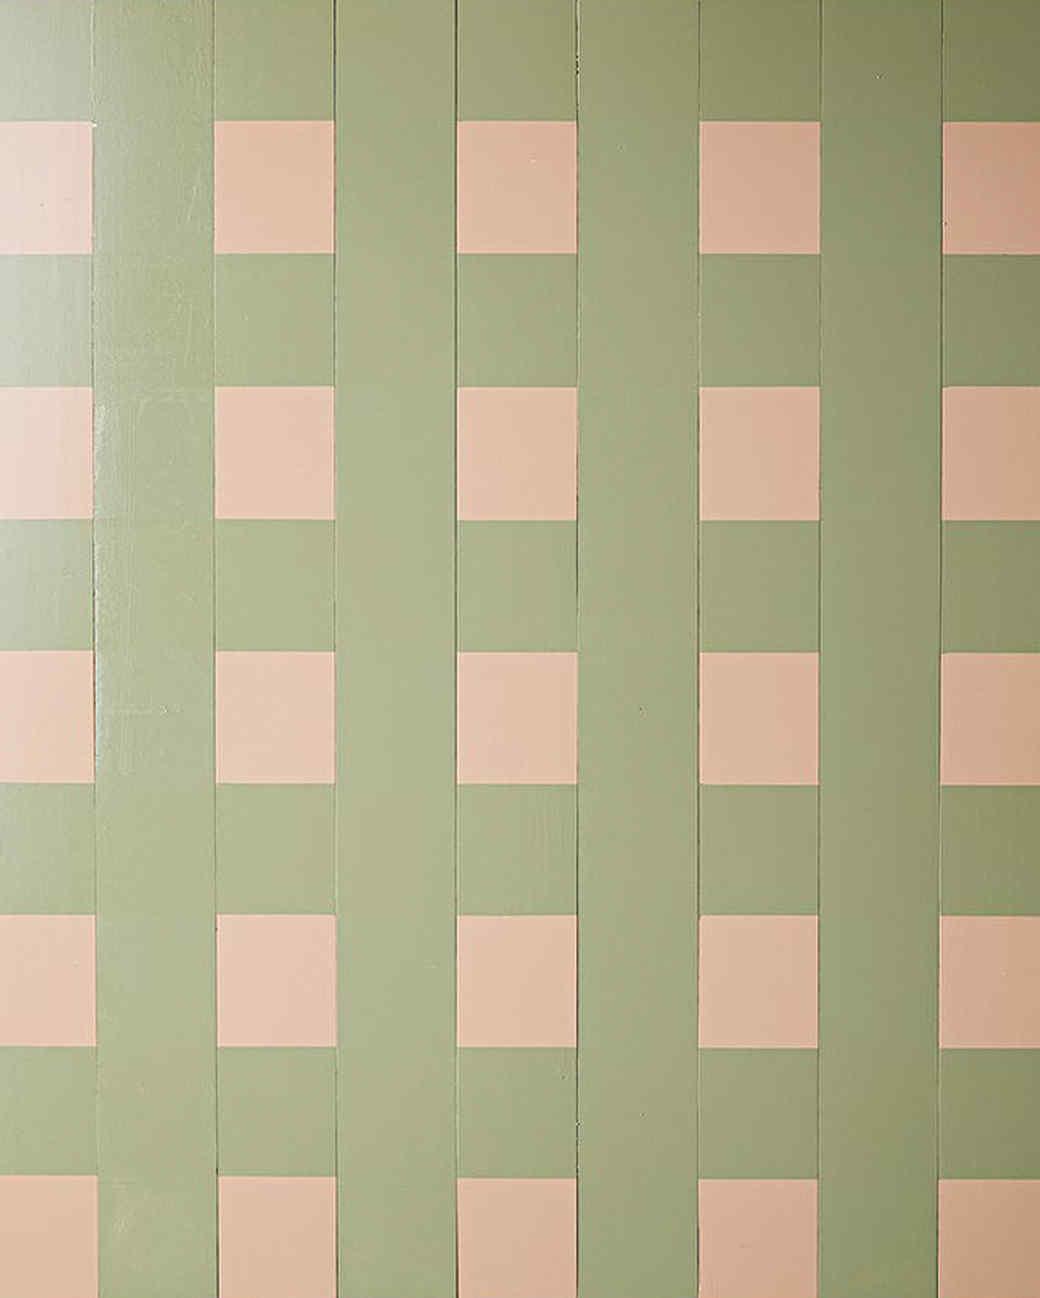 striped-floor-1-179-d112909.jpg